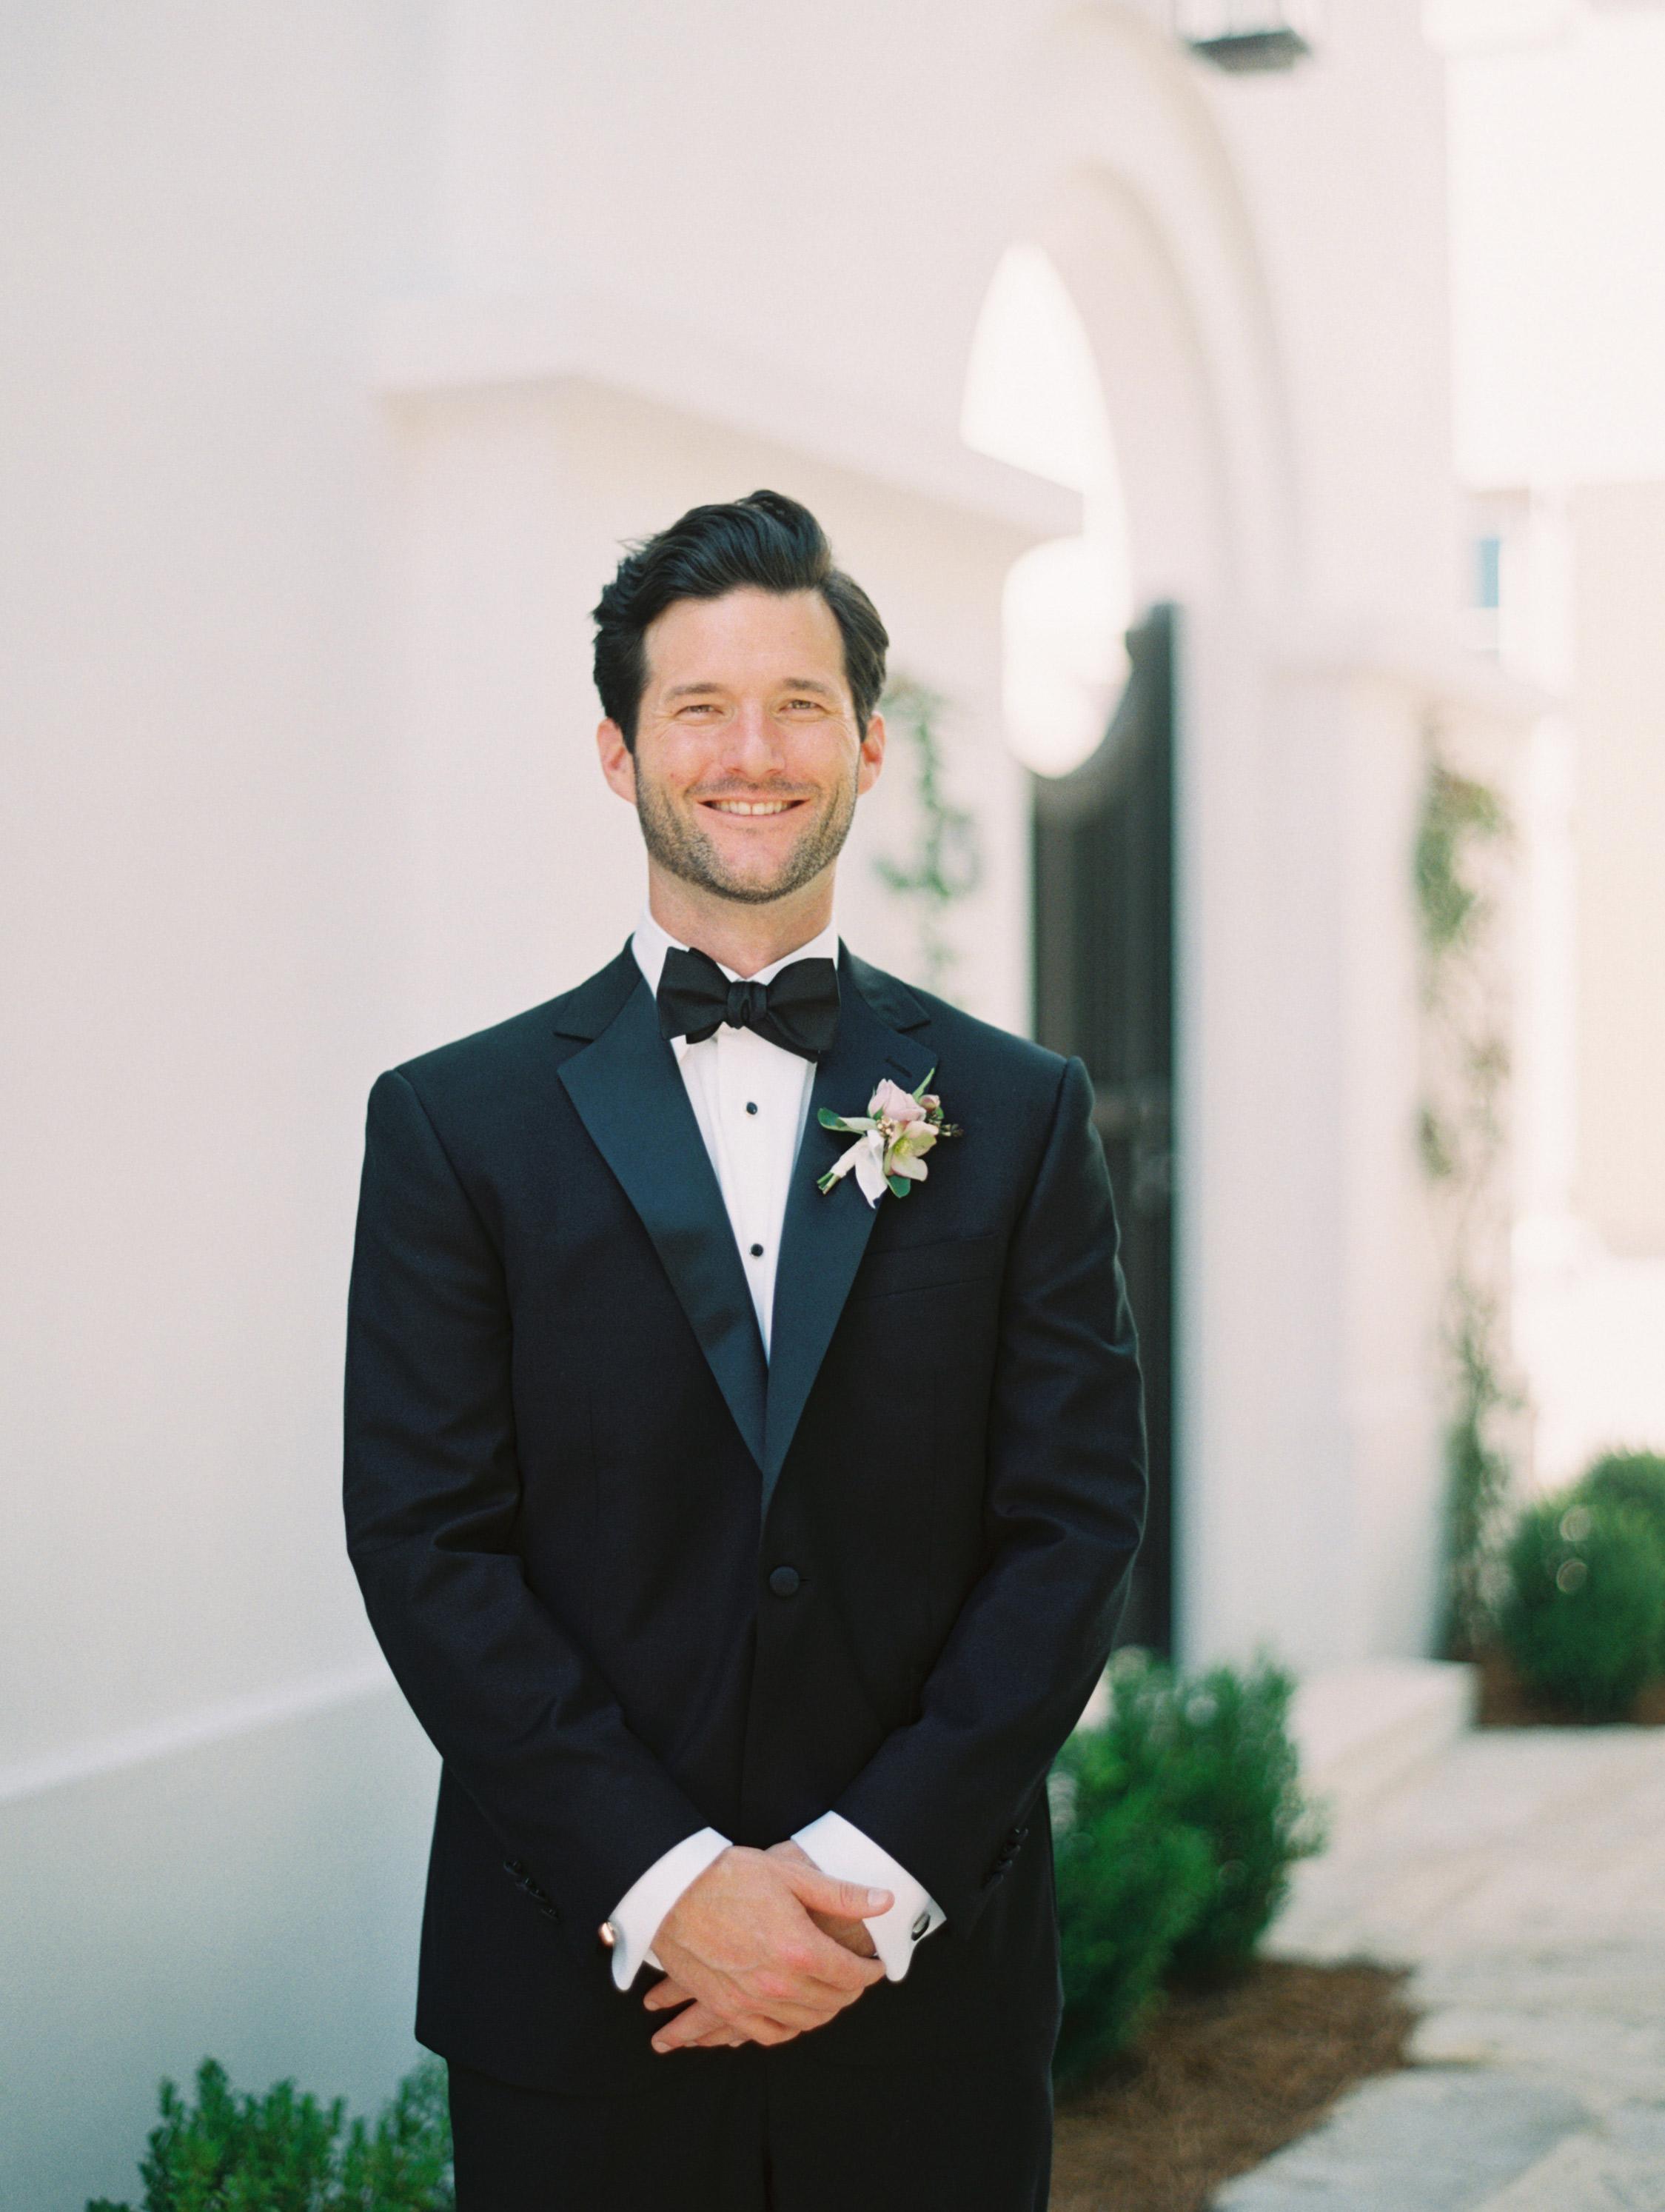 leighton craig wedding groom with arms crossed